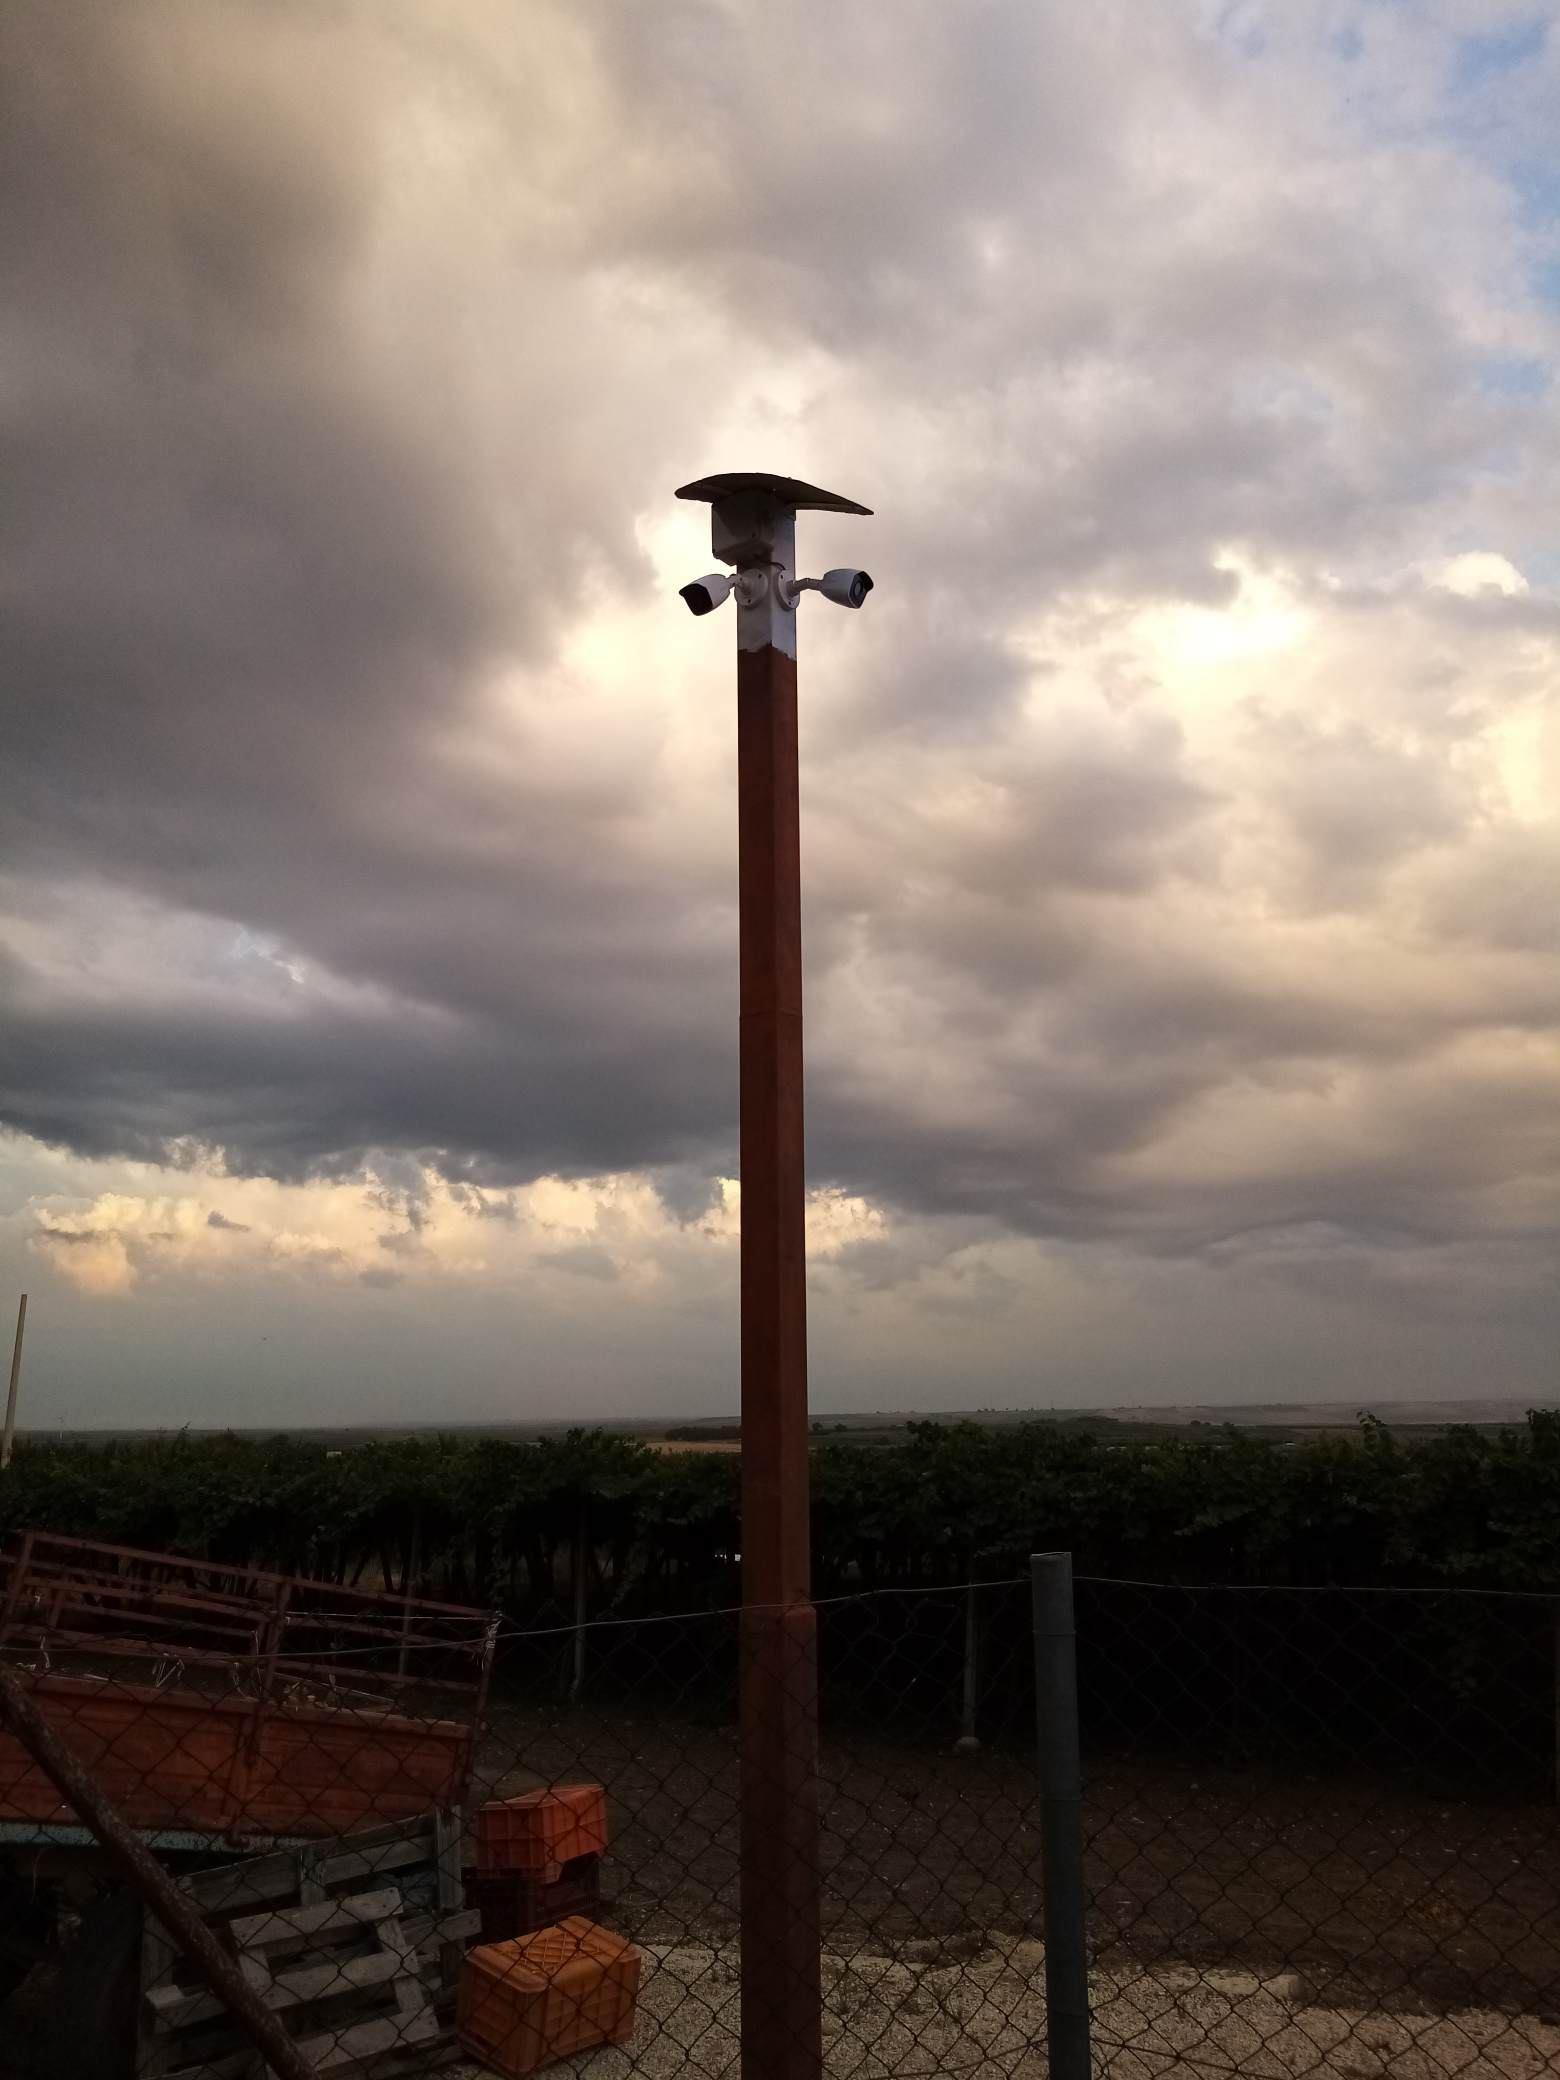 http://www.energialternativa.info/public/newforum/ForumEA/U/telecamera-2.jpg